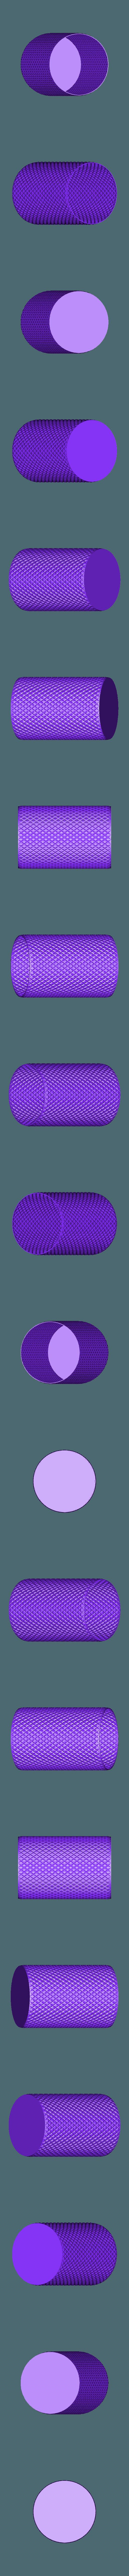 kv2_pot_07.stl Download free SCAD file Knurled Pencils Pot • Template to 3D print, Wachet